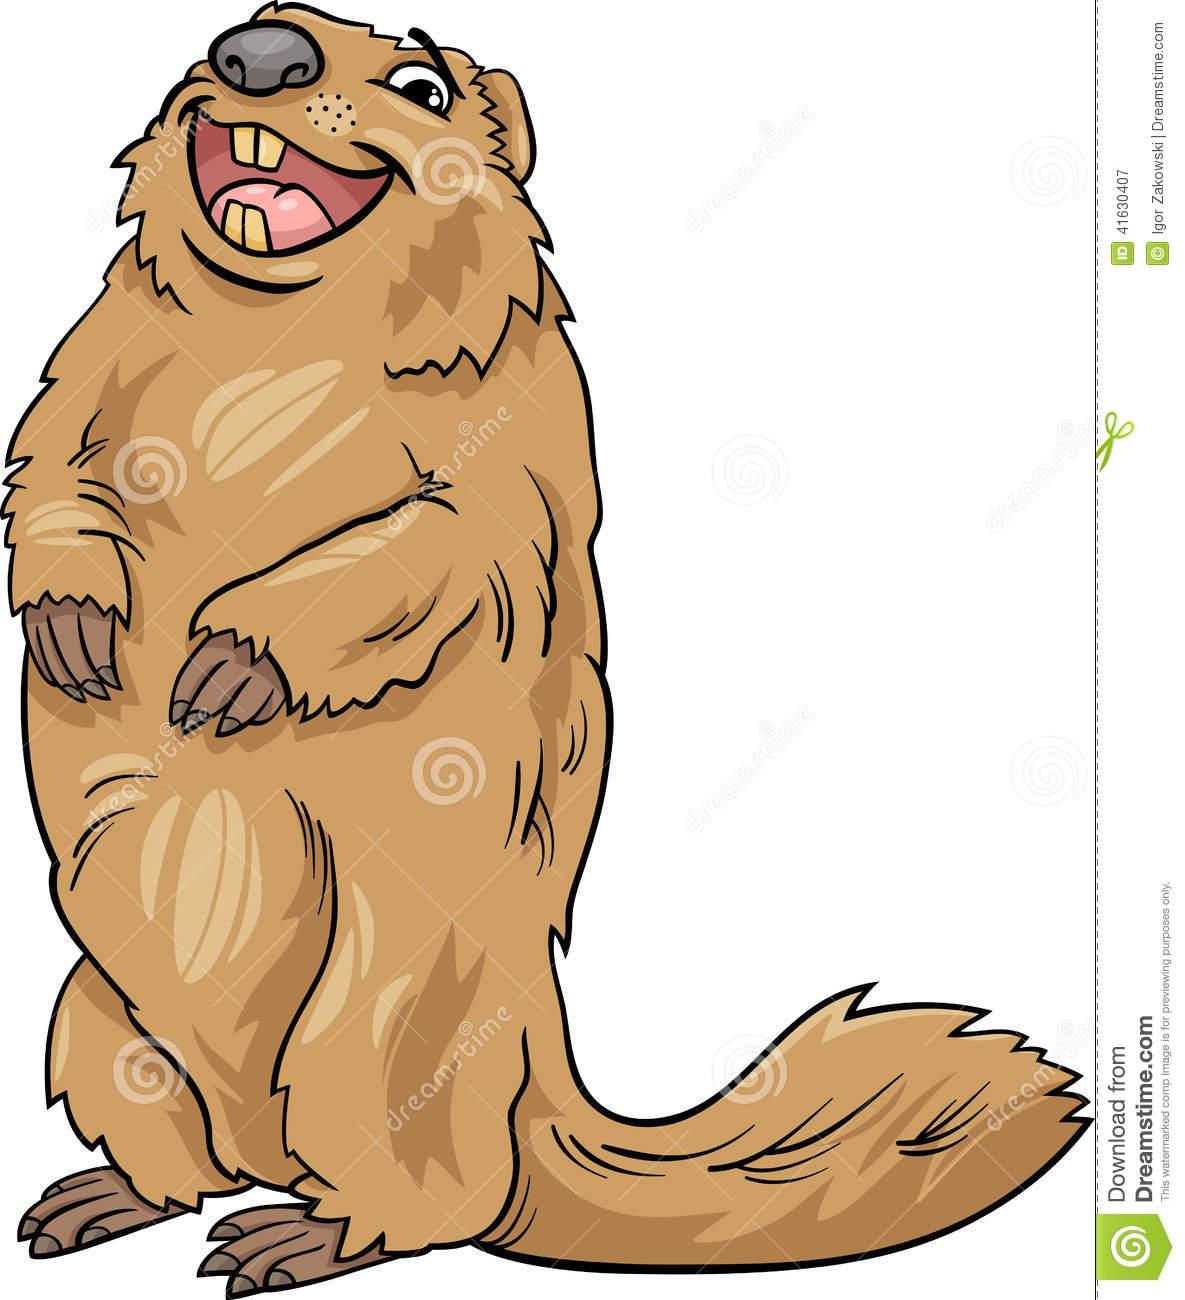 Marmot Animal Cartoon Illustration Stock Vector.